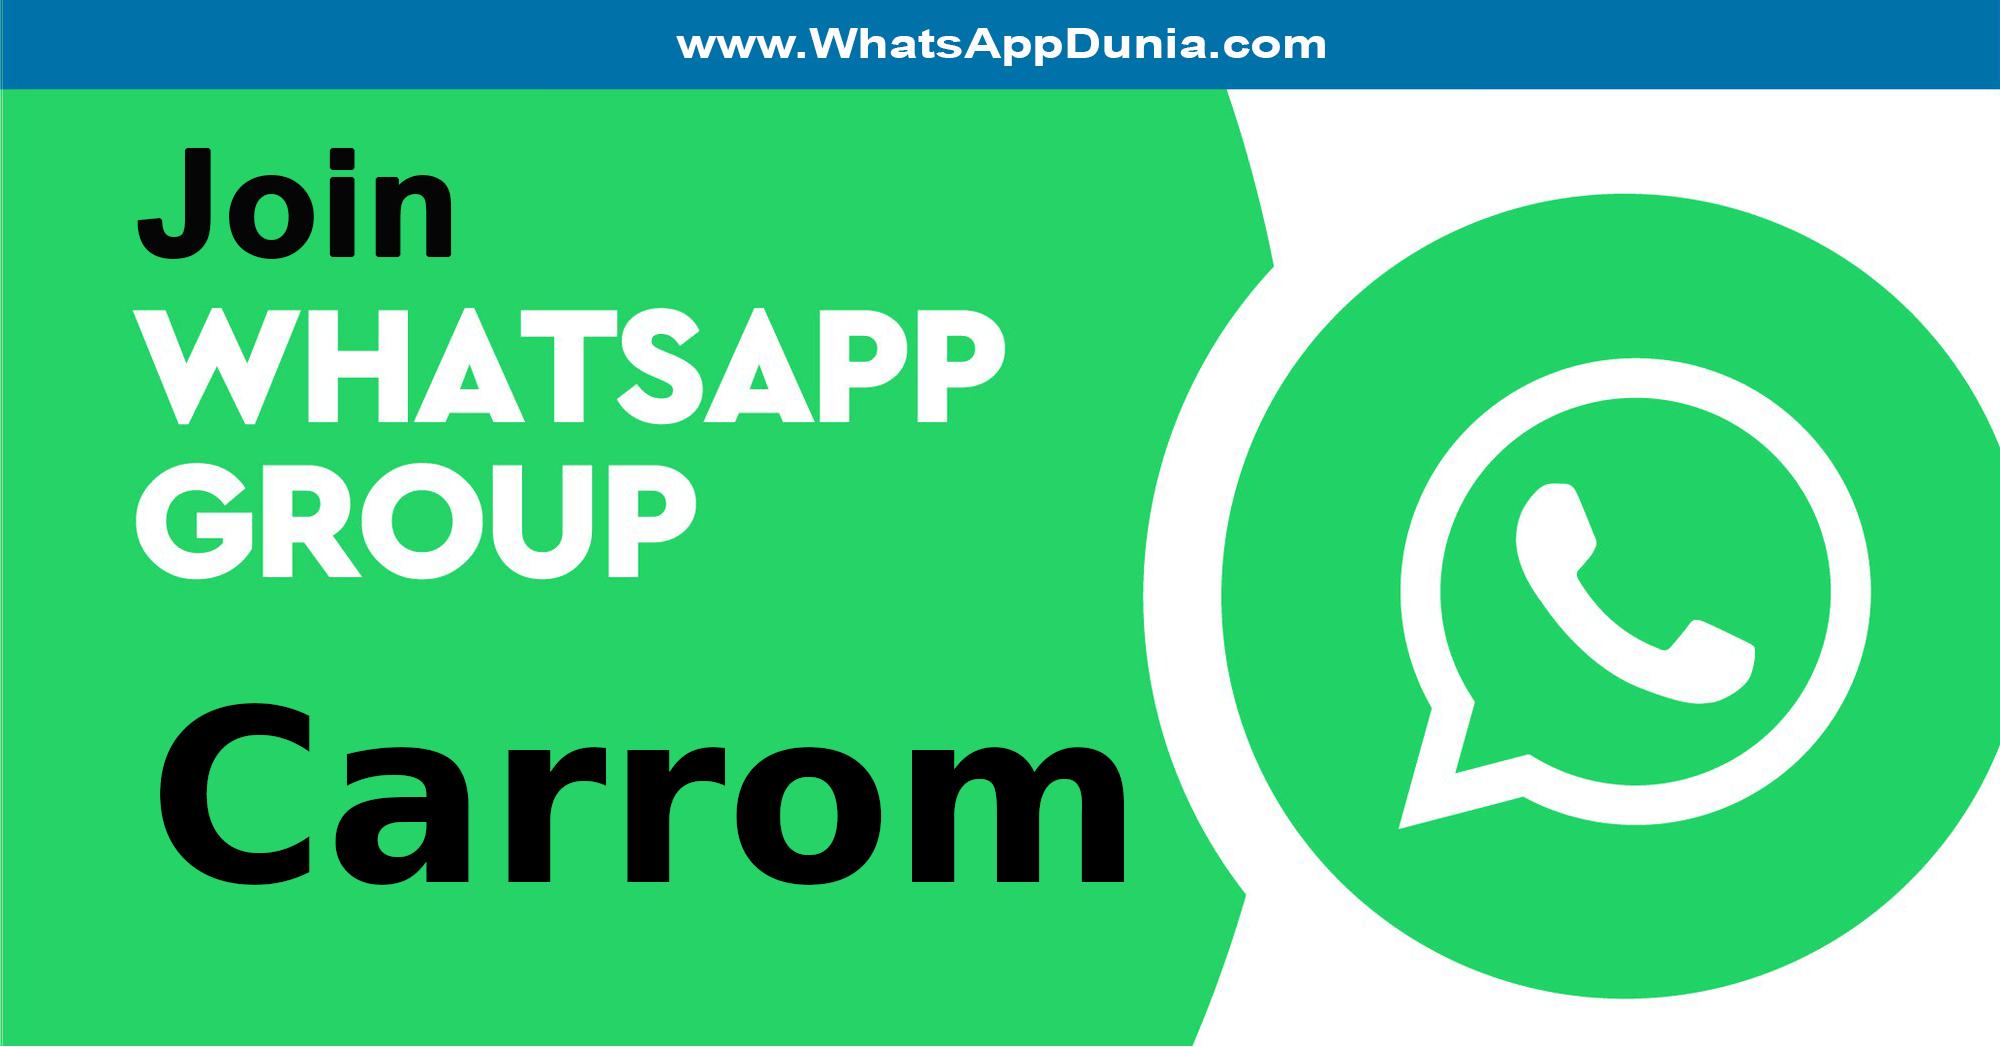 Carrom WhatsApp Group Links